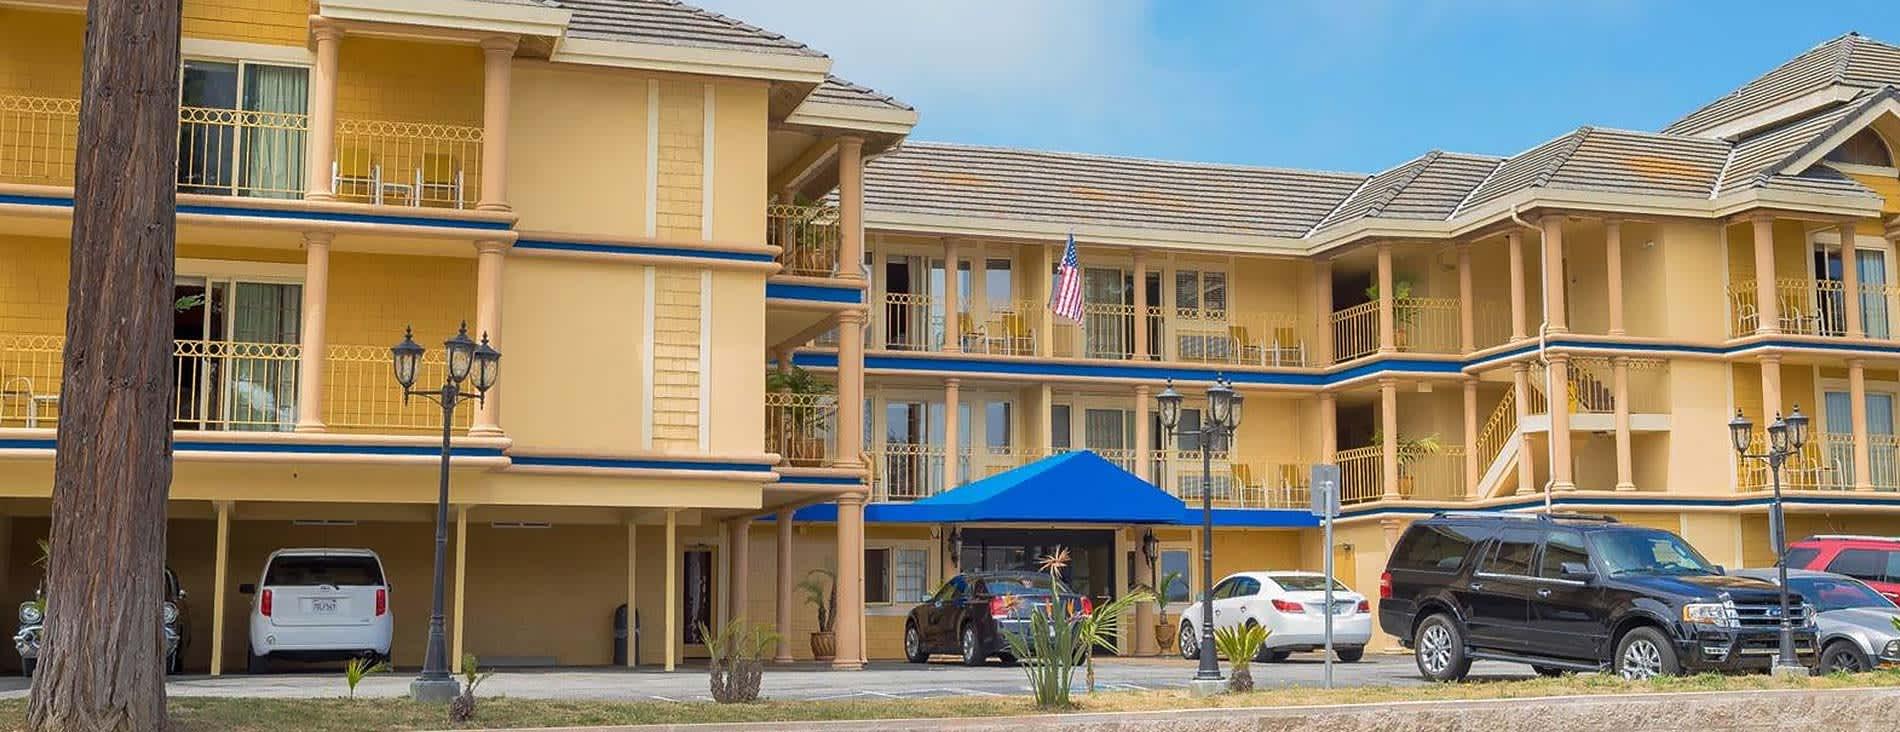 Hotel Solares Riverside Avenue Santa Cruz California Service Main Image